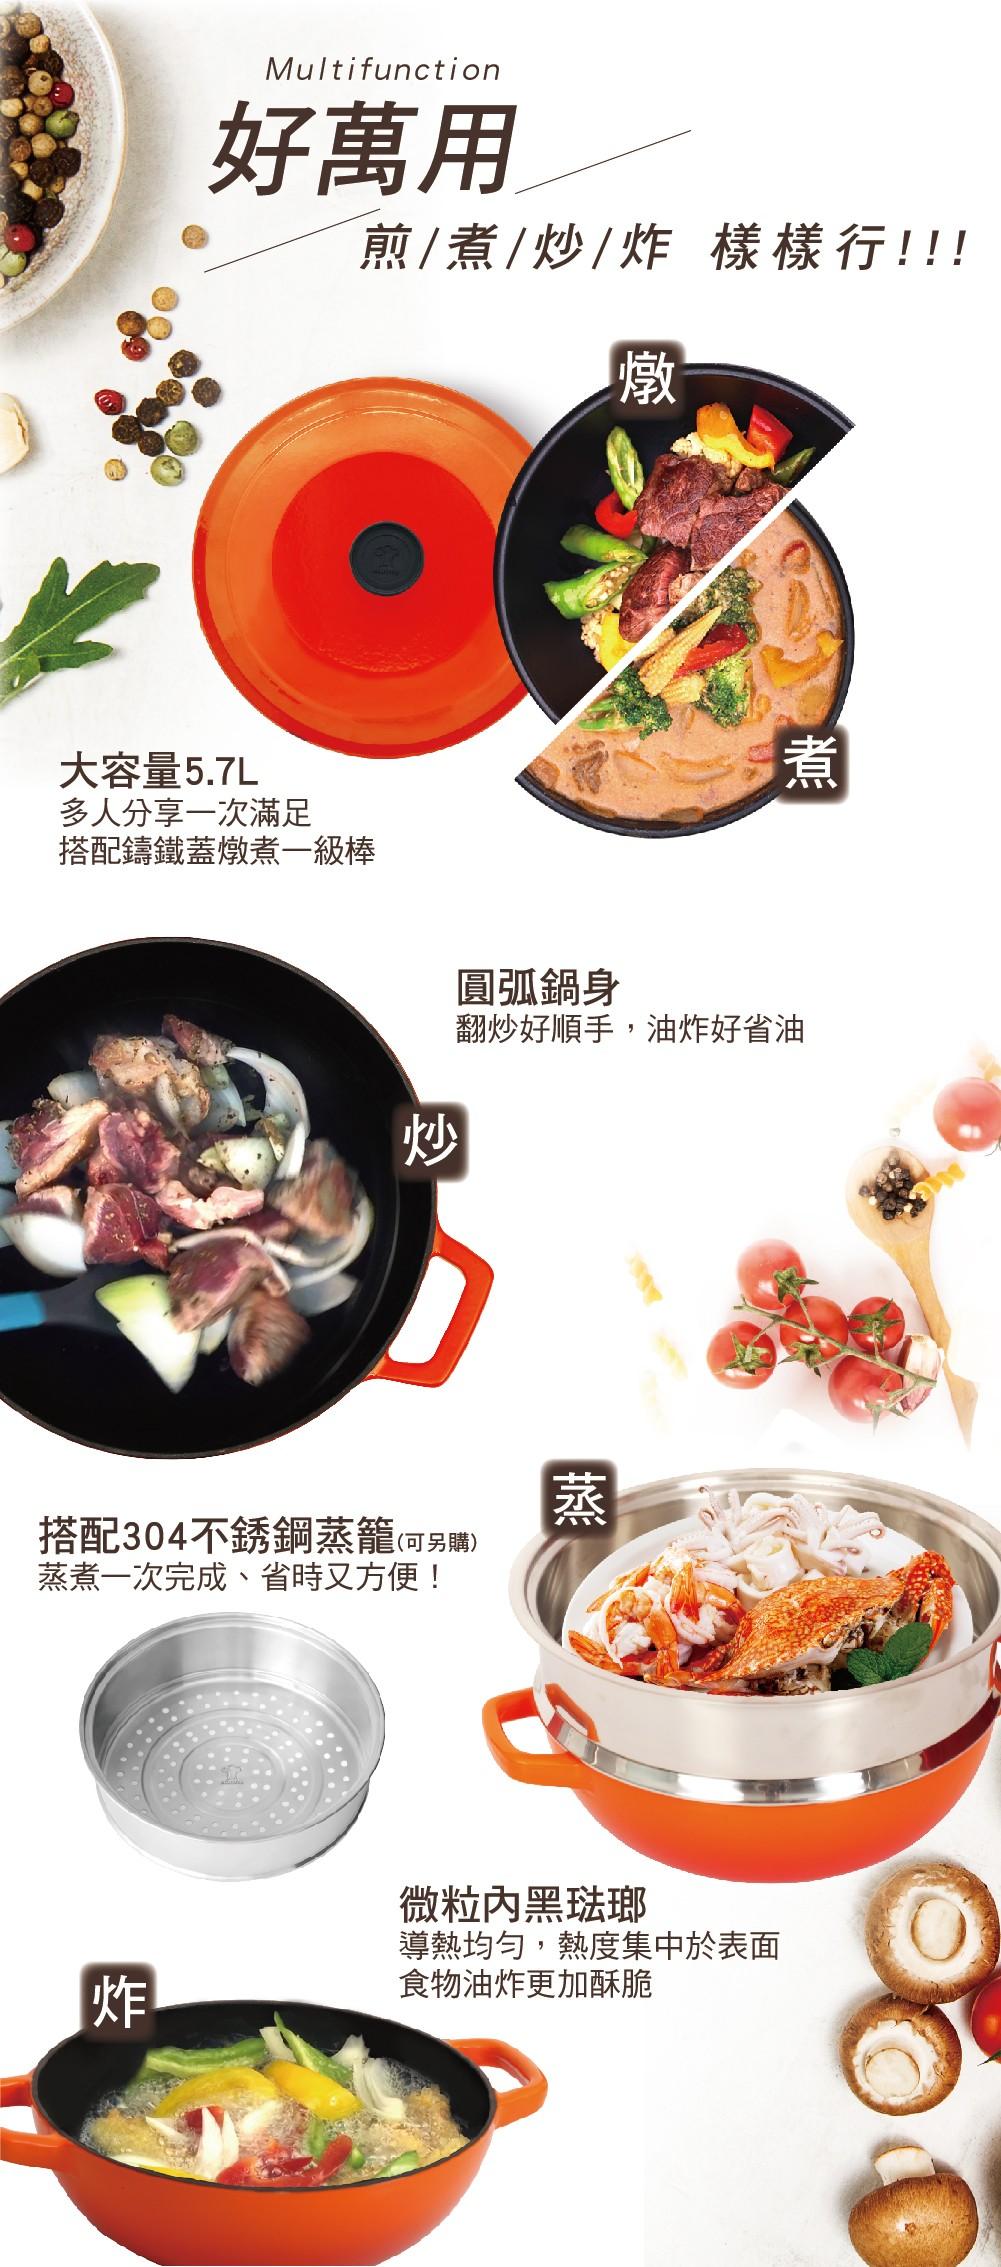 25cm媽媽鍋 landing page3.jpg